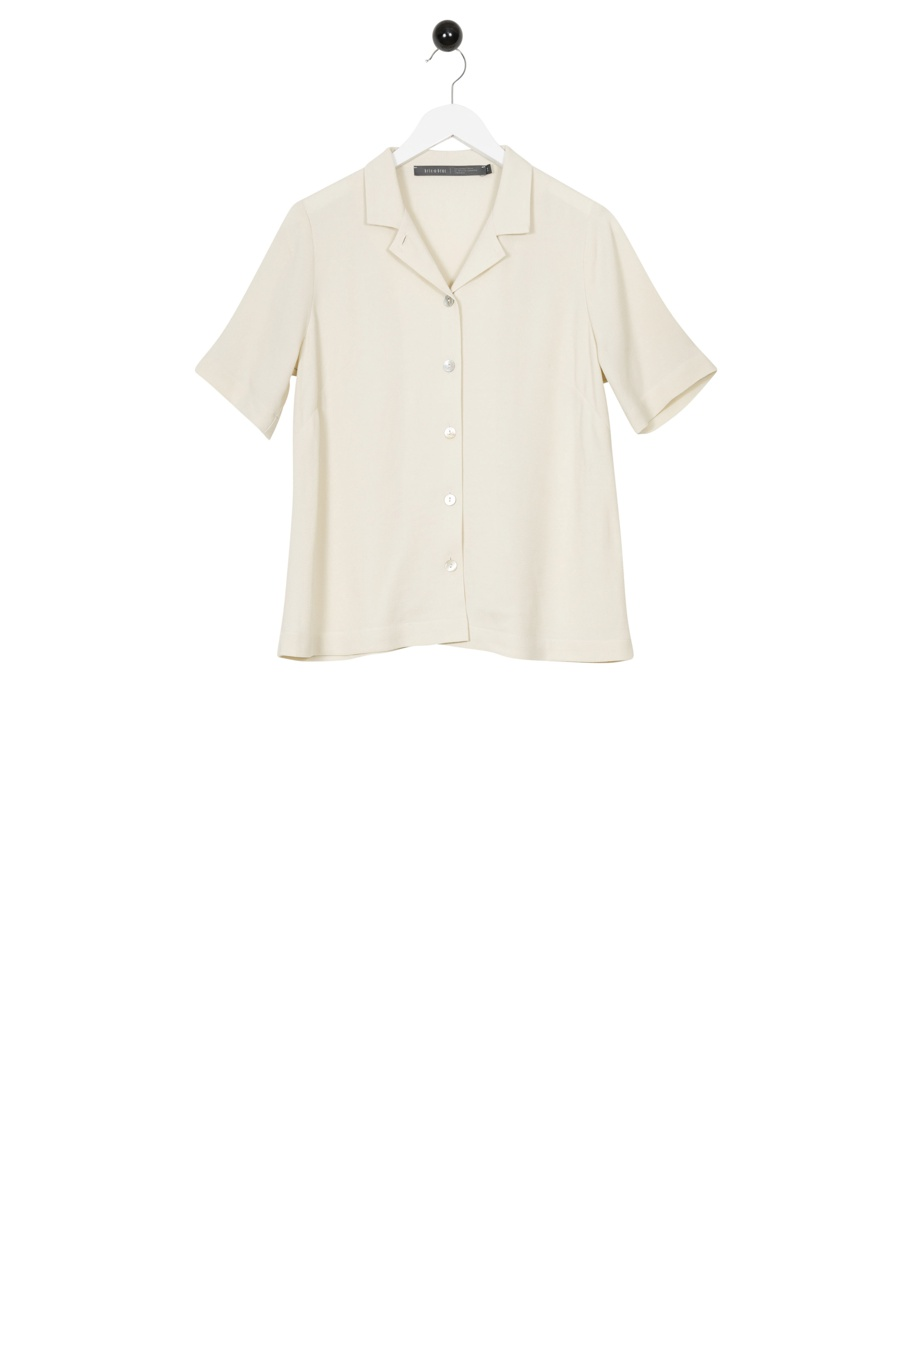 Lyon Shirt S.S.